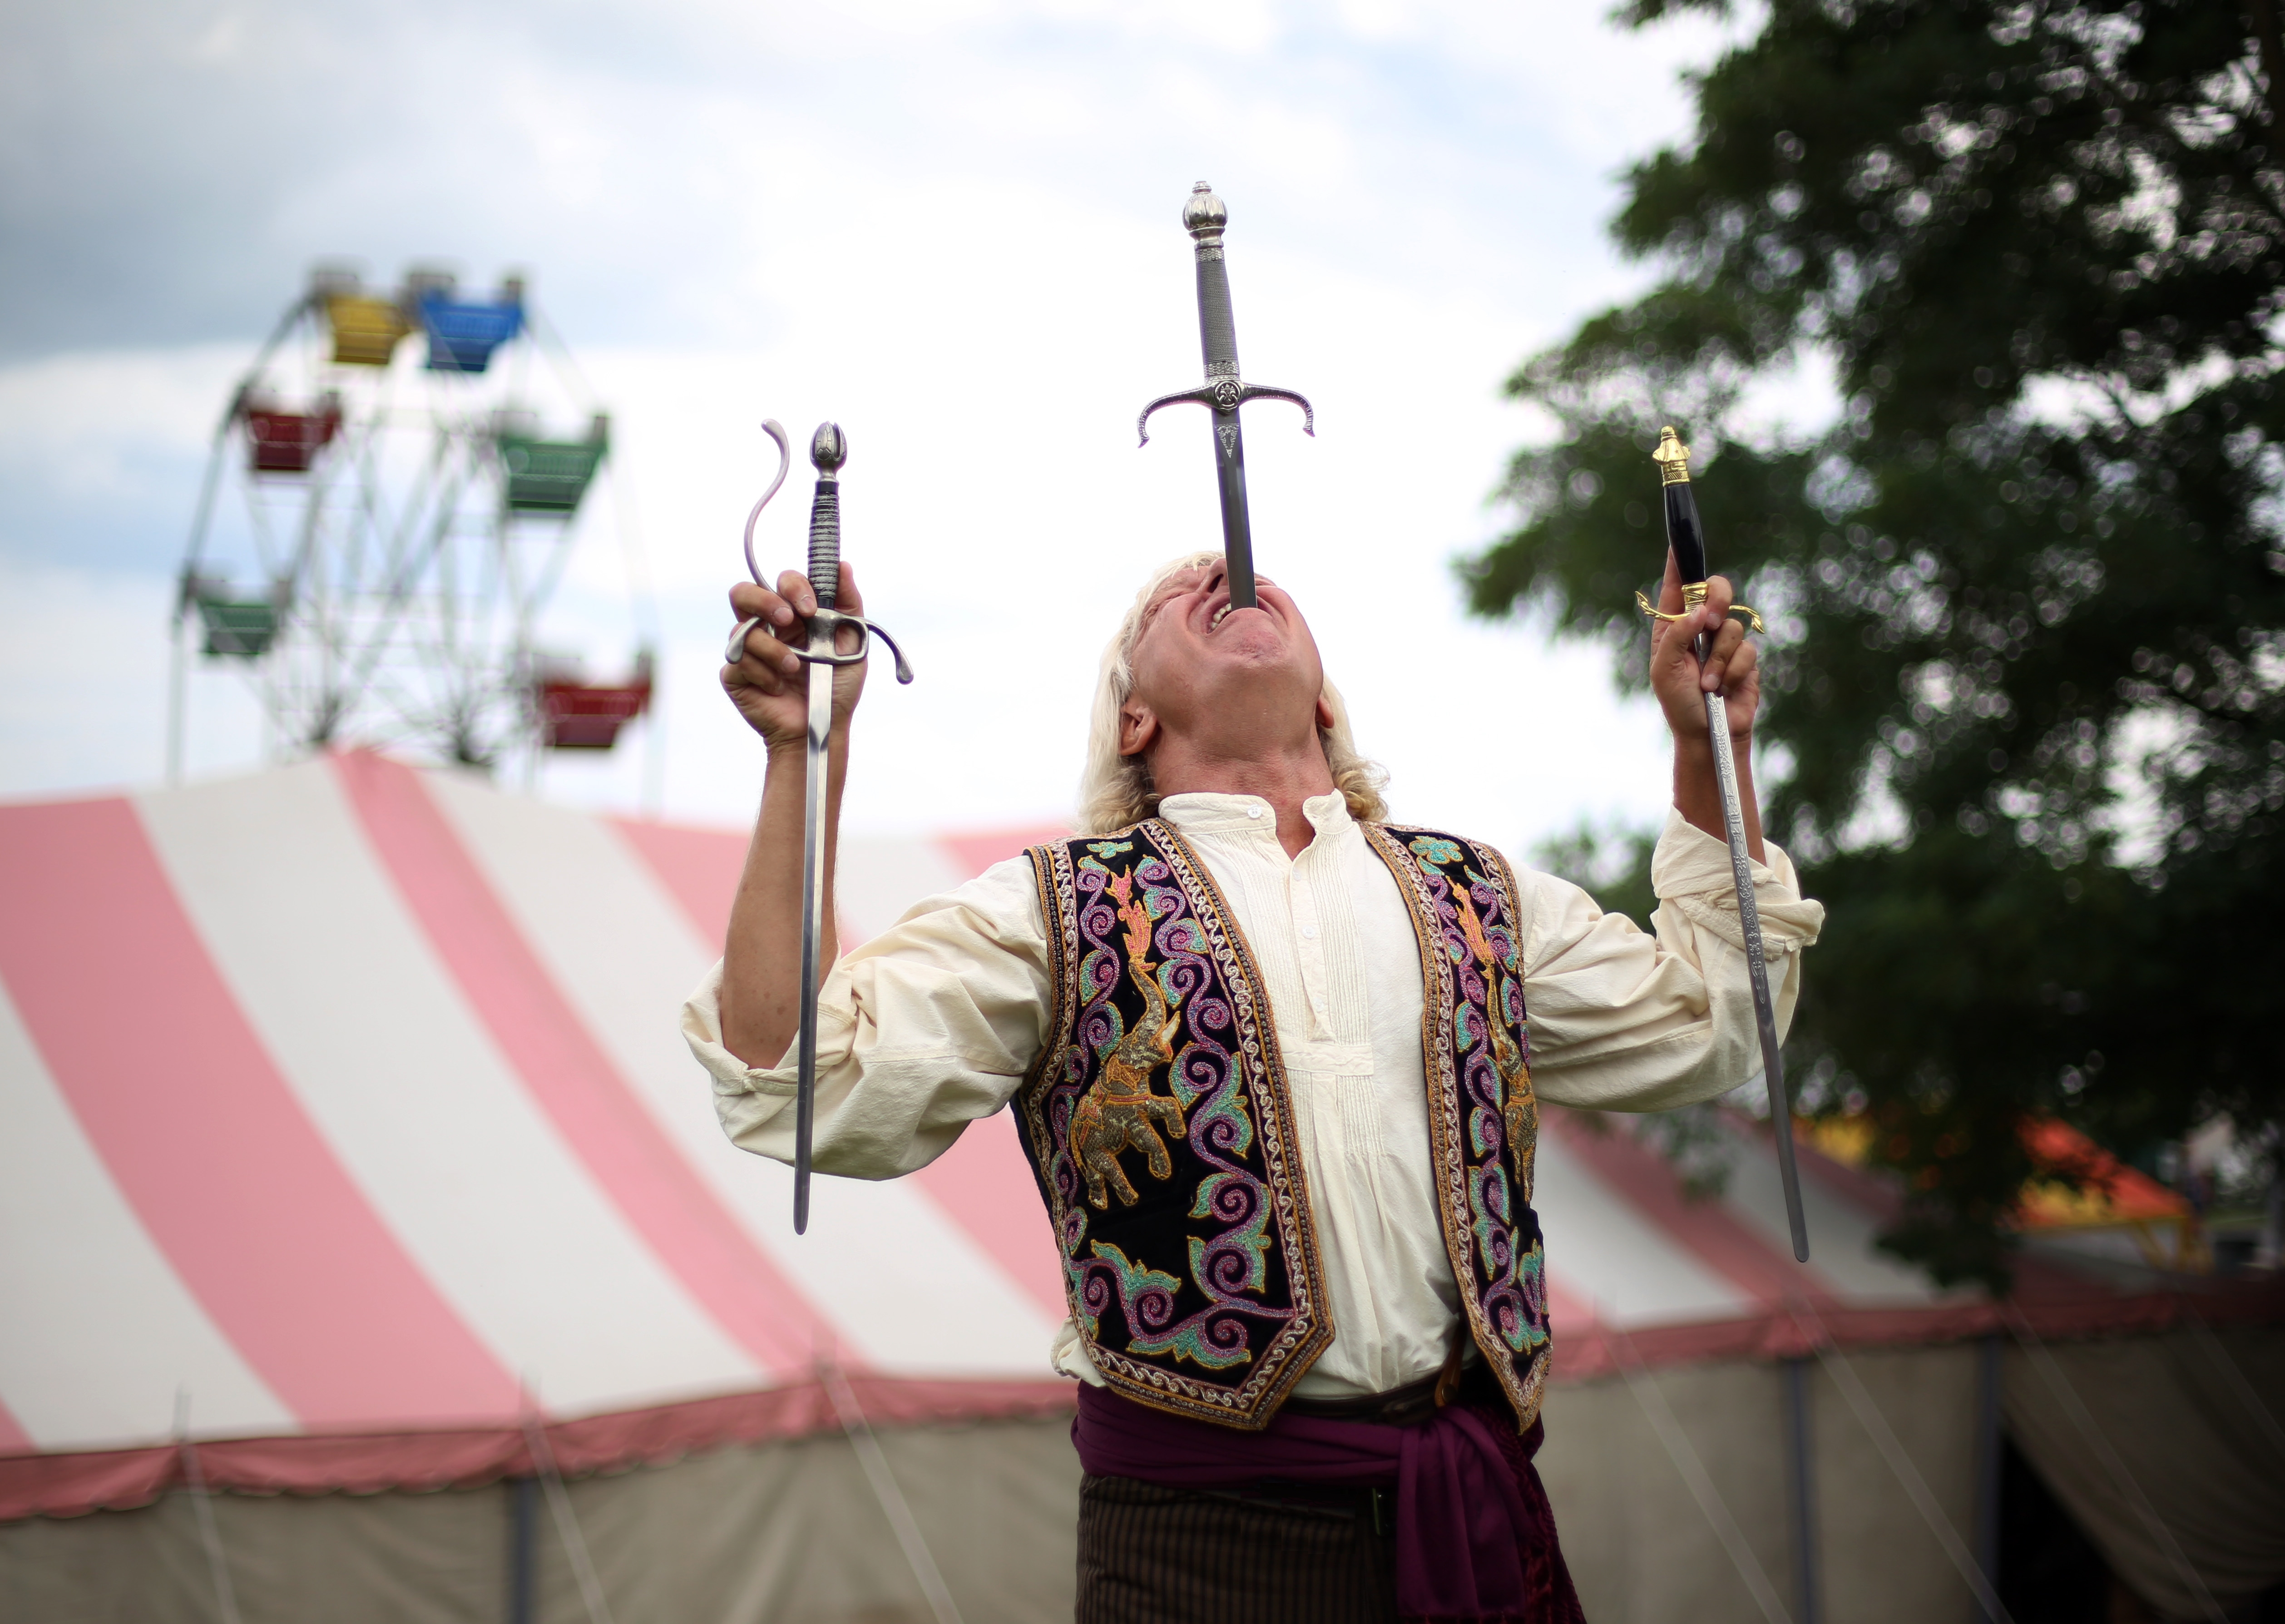 Sword-Swallower-at-a-Carnival-Dan-Meyer-2017-3-swords-COLOR.jpg